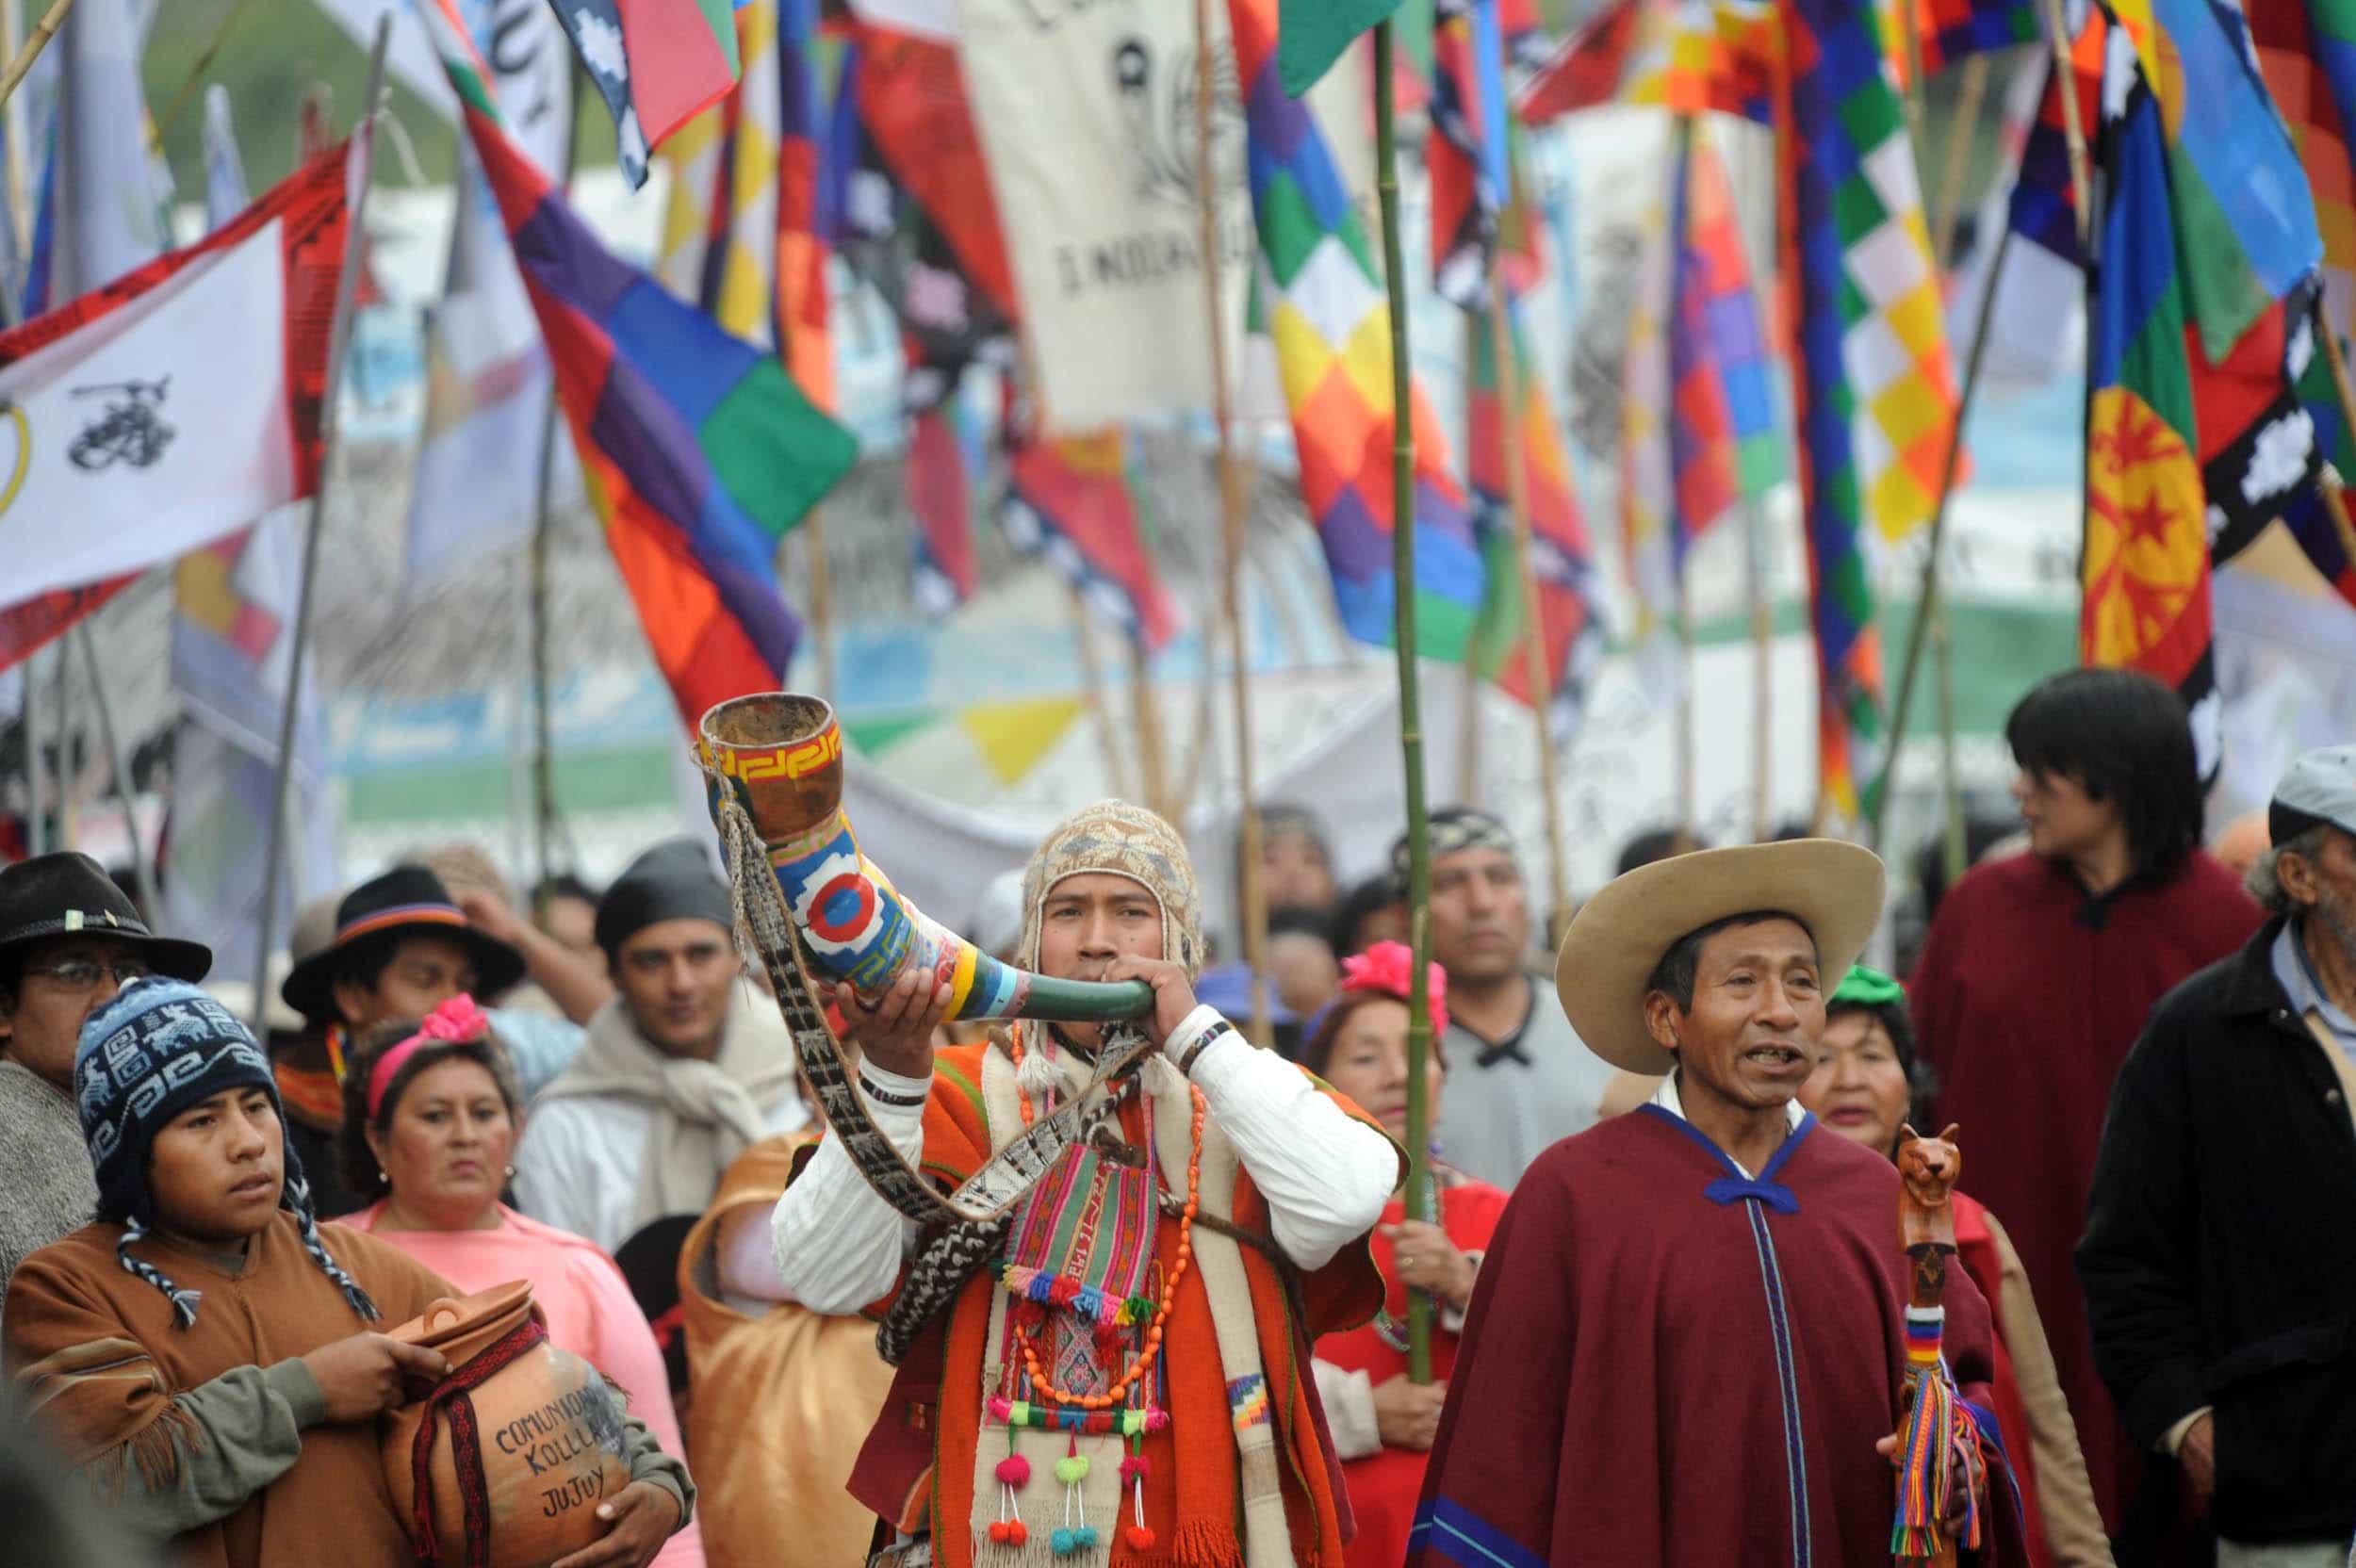 Pueblos originarios de Argentina huarpes: